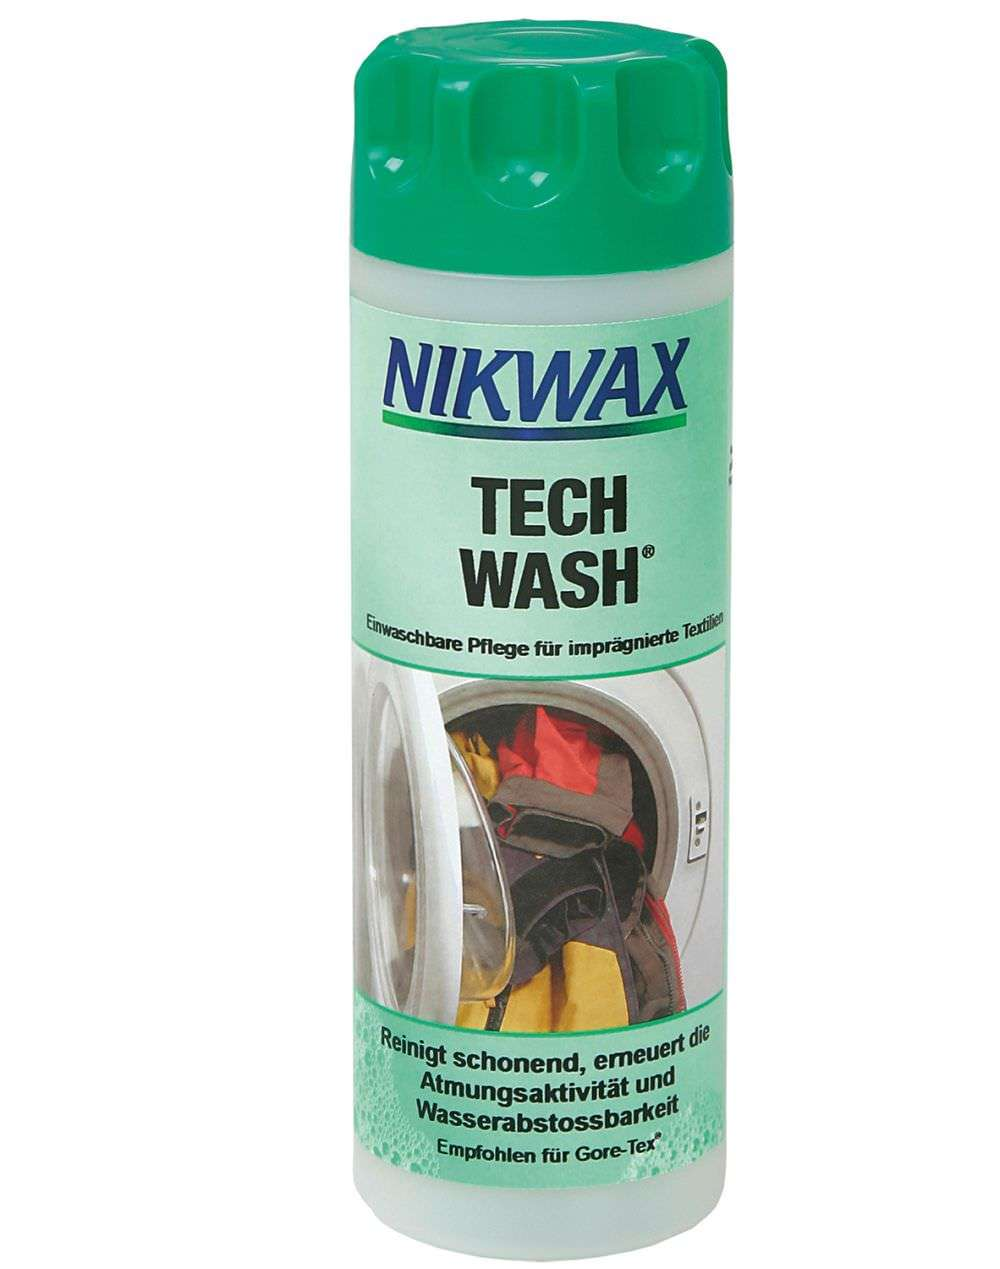 Nikwax Tech Wash Imprägnirmittel  300ml